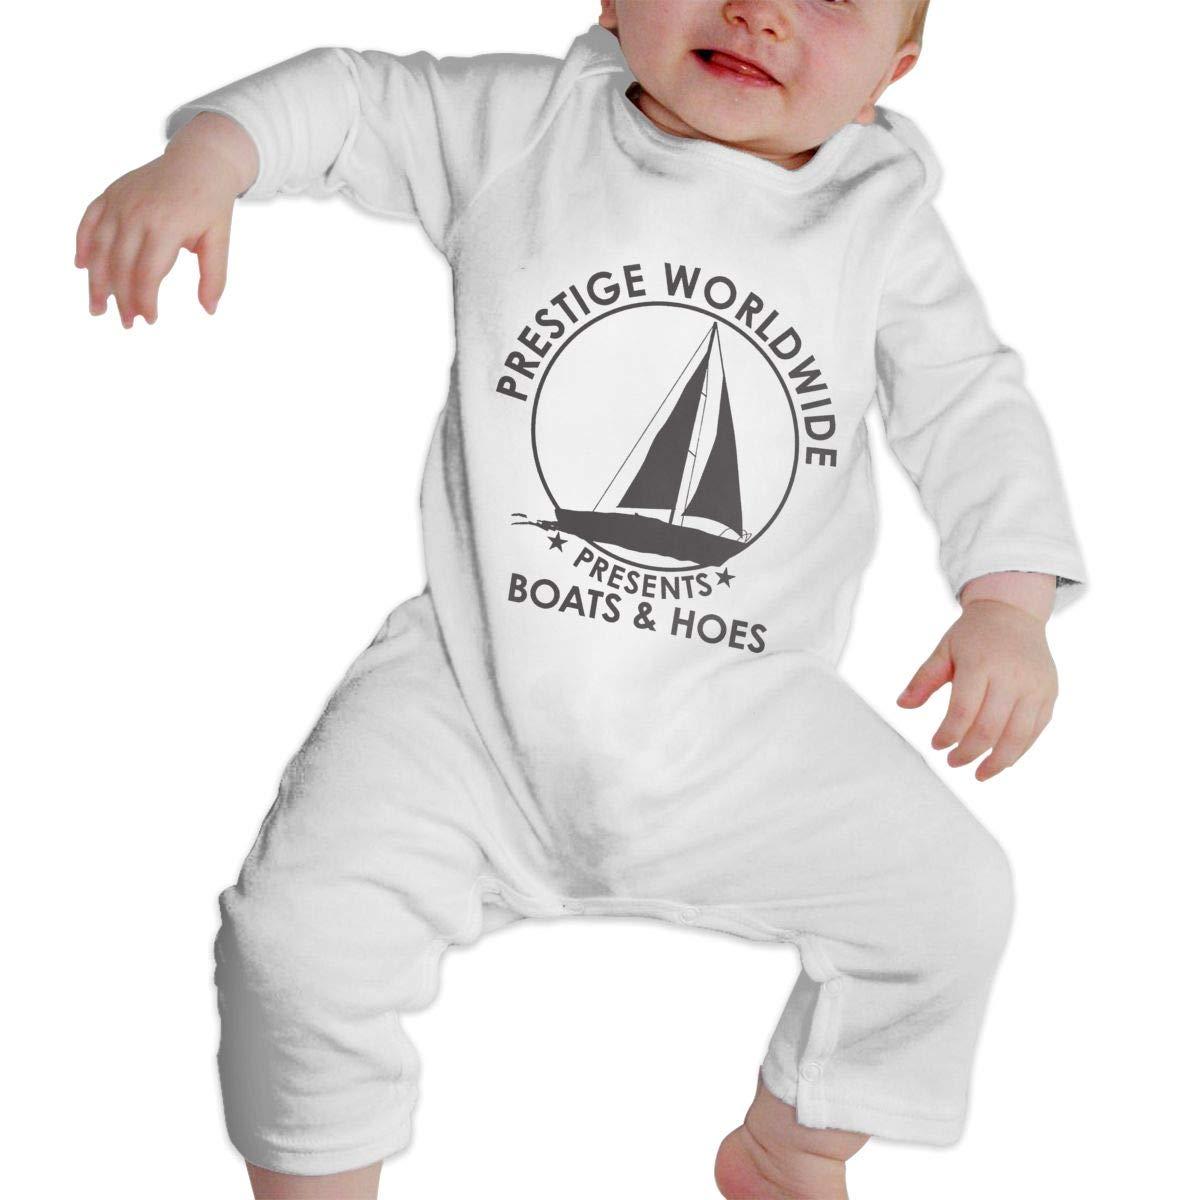 SININIDR Newborn Jumpsuit Infant Baby Girls Prestige Worldwide Long-Sleeve Bodysuit Playsuit Outfits Clothes Black